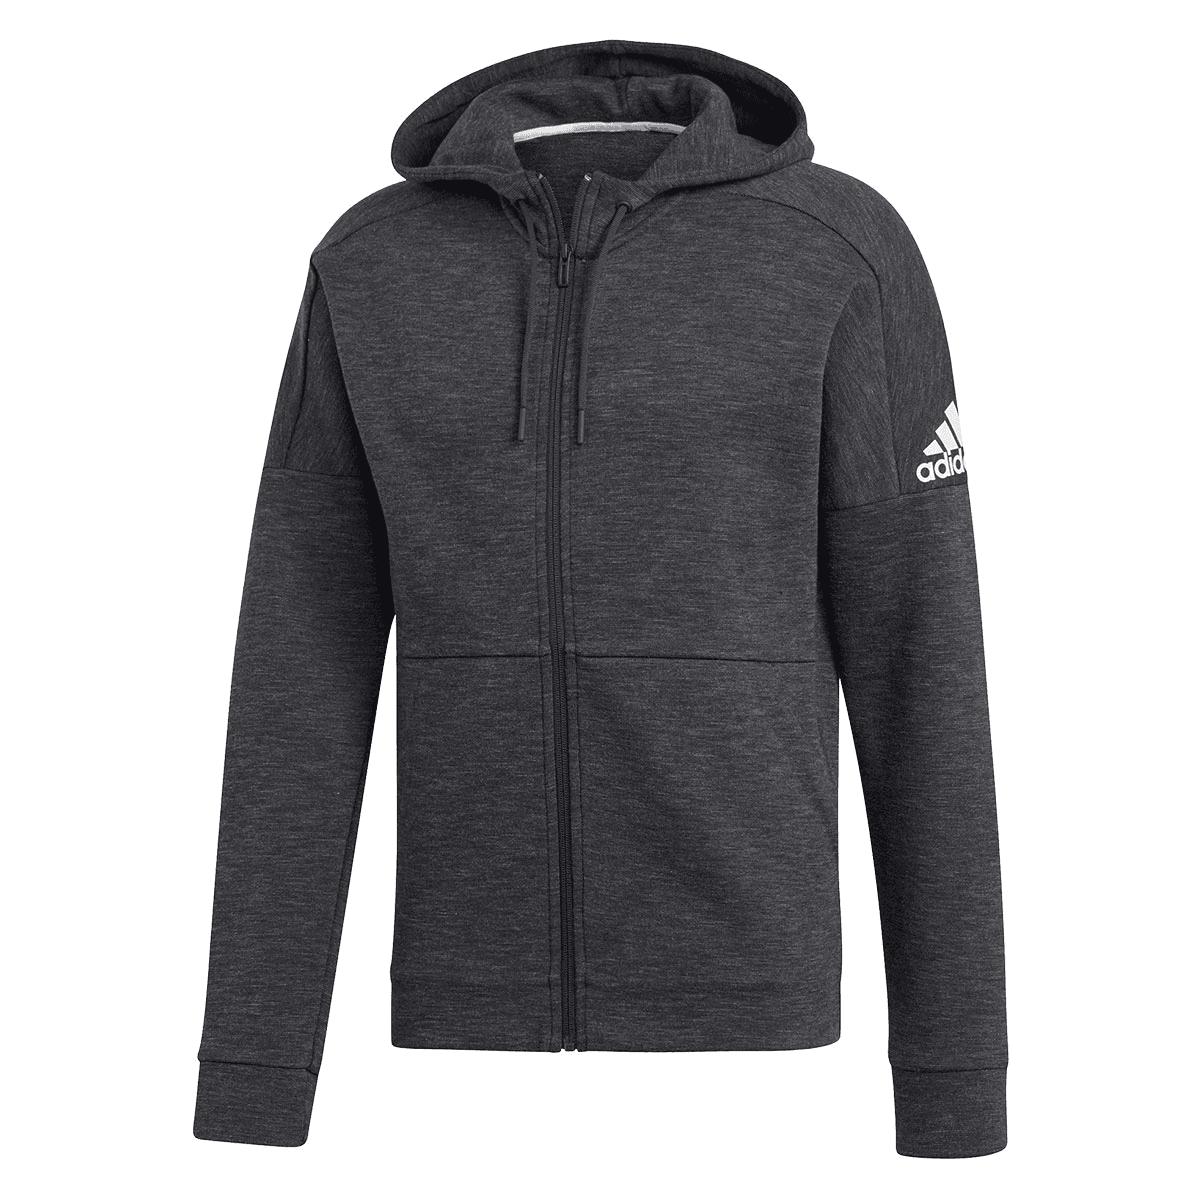 Adidas jas met capuchon Stadium ID zwartwit